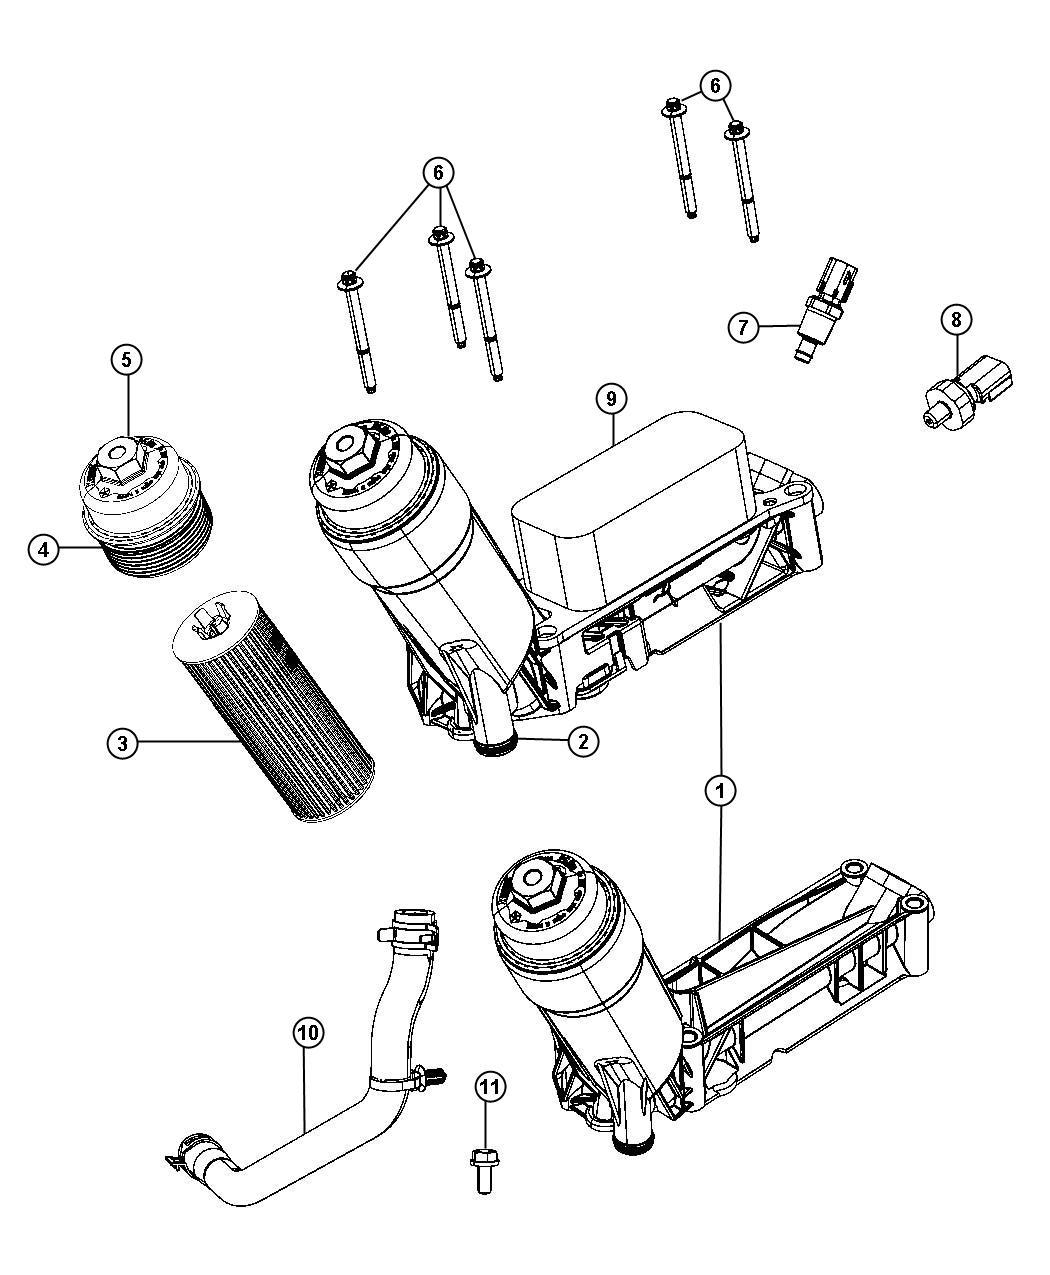 2009 Chrysler Aspen Sensor. Coolant temperature, fluid